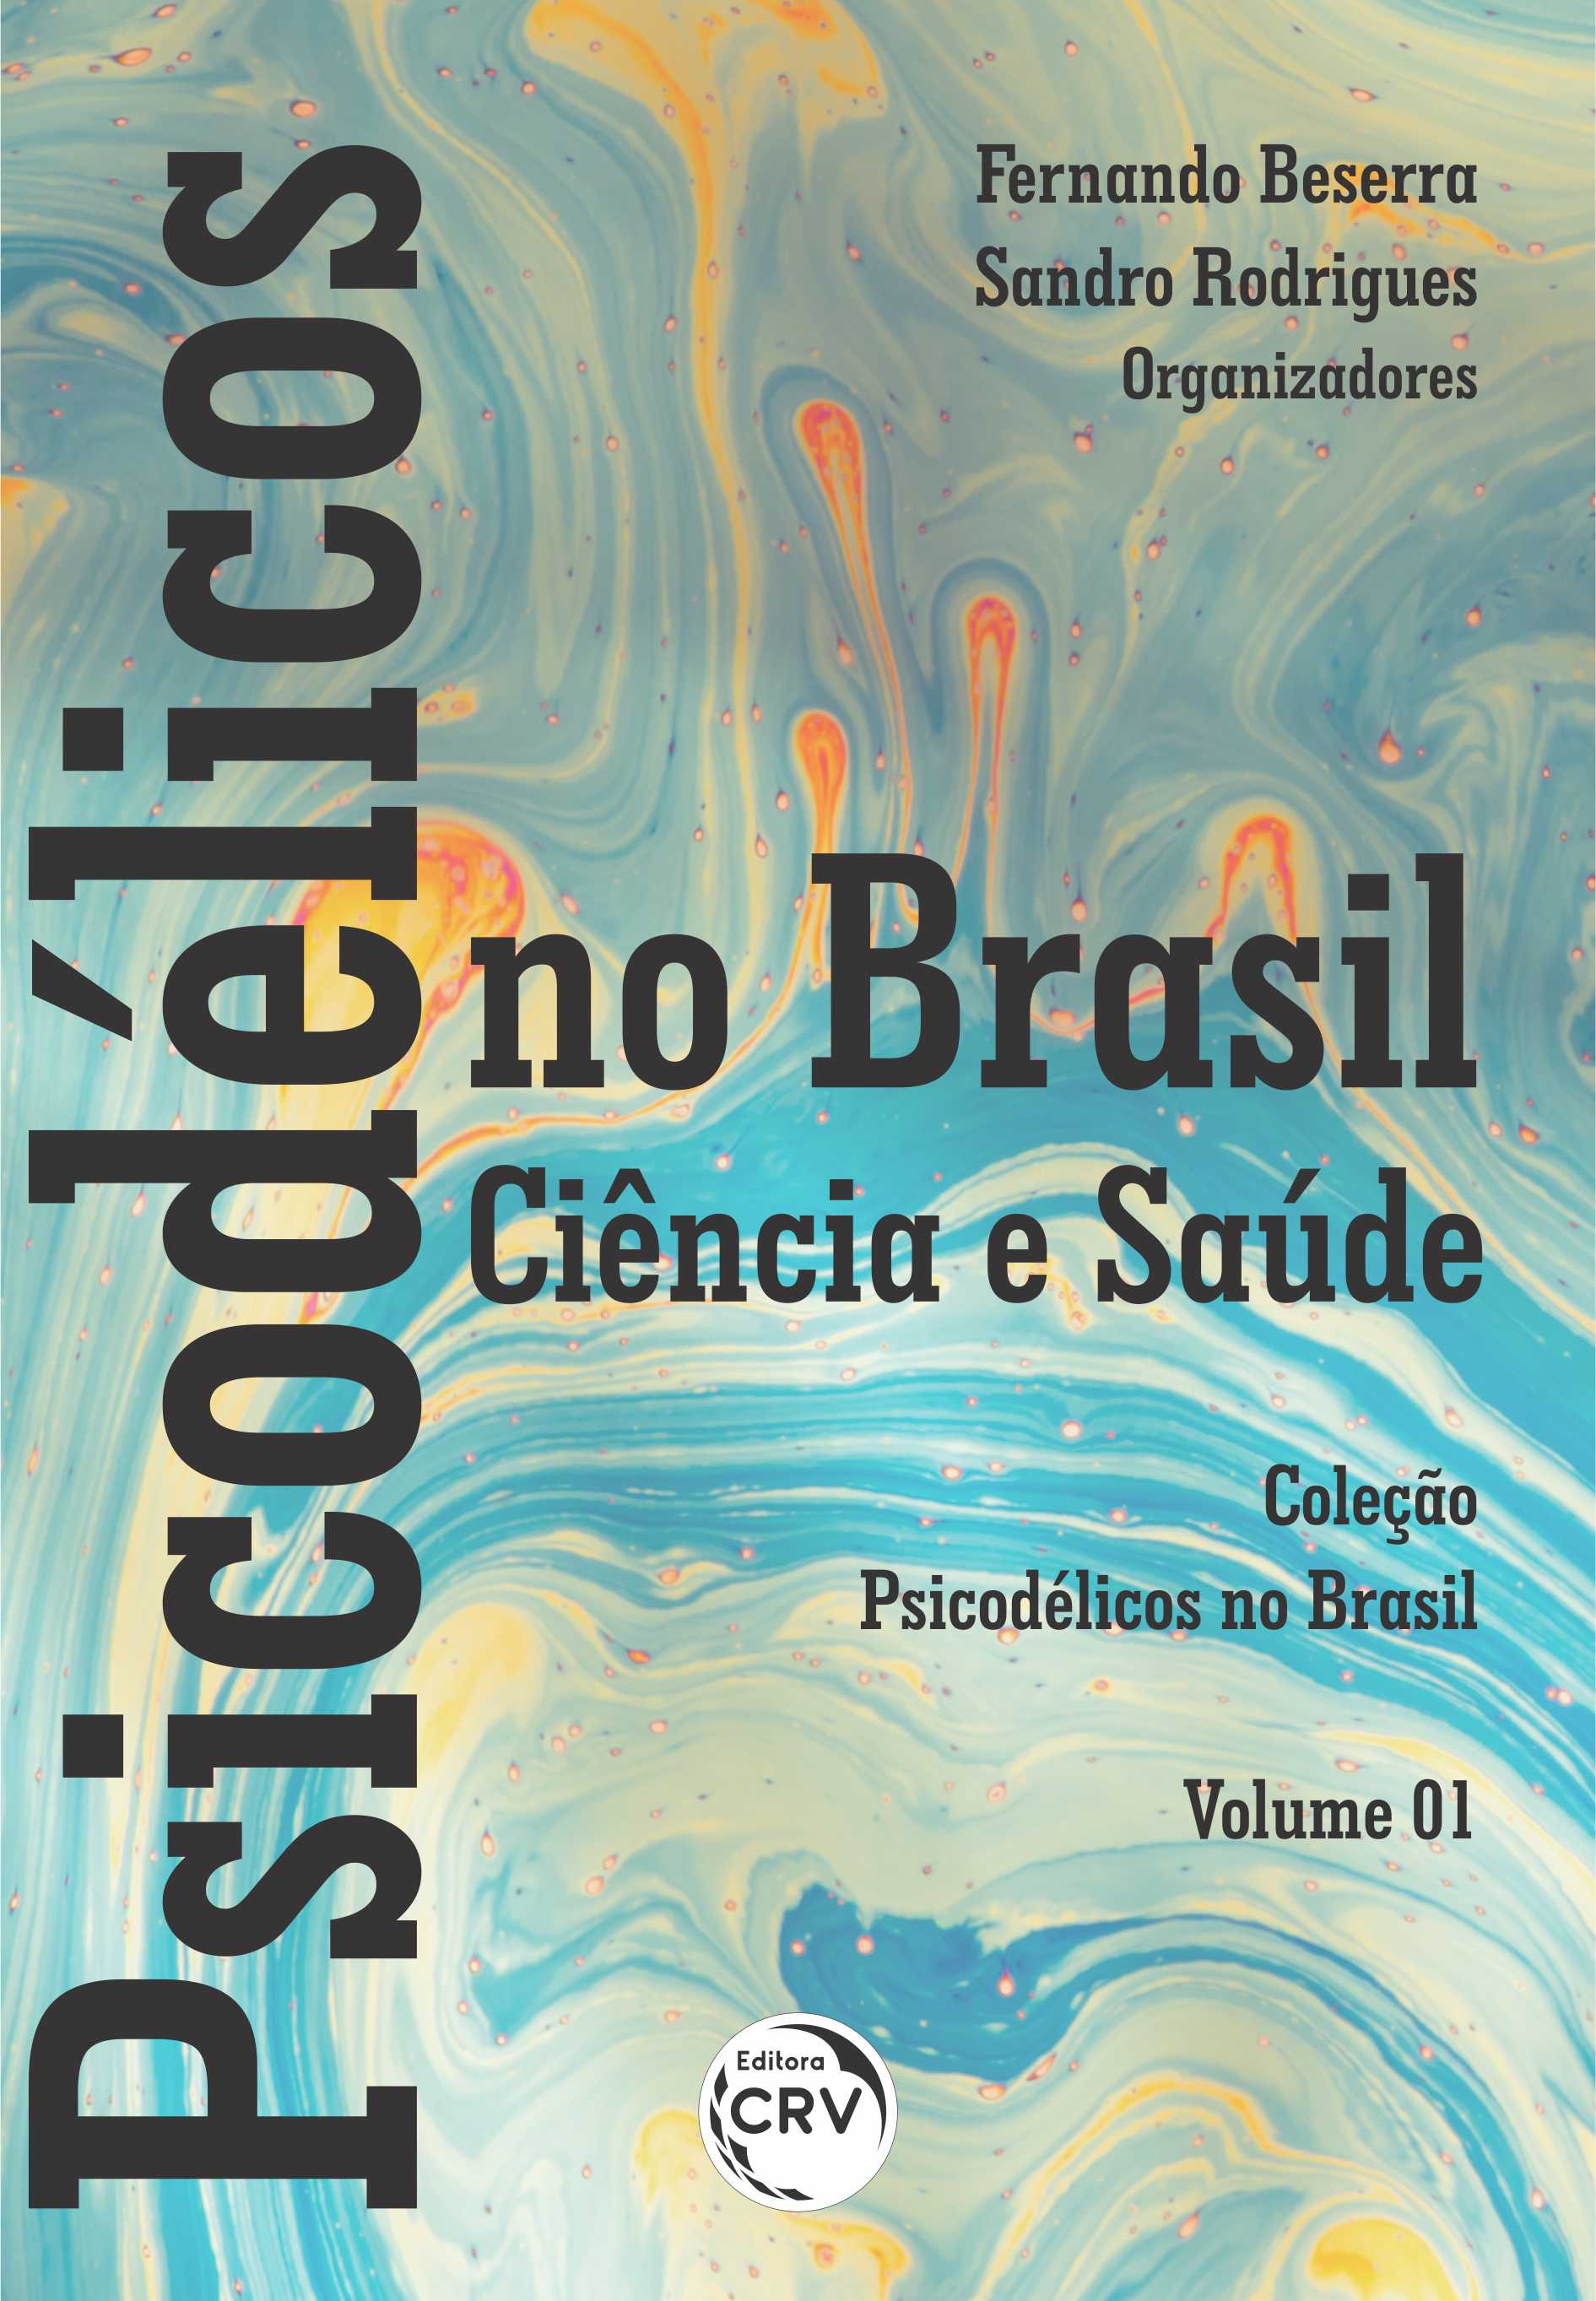 Capa do livro: PSICODÉLICOS NO BRASIL: <BR>ciência e saúde <br> Coleção Psicodélicos no Brasil - Volume 01